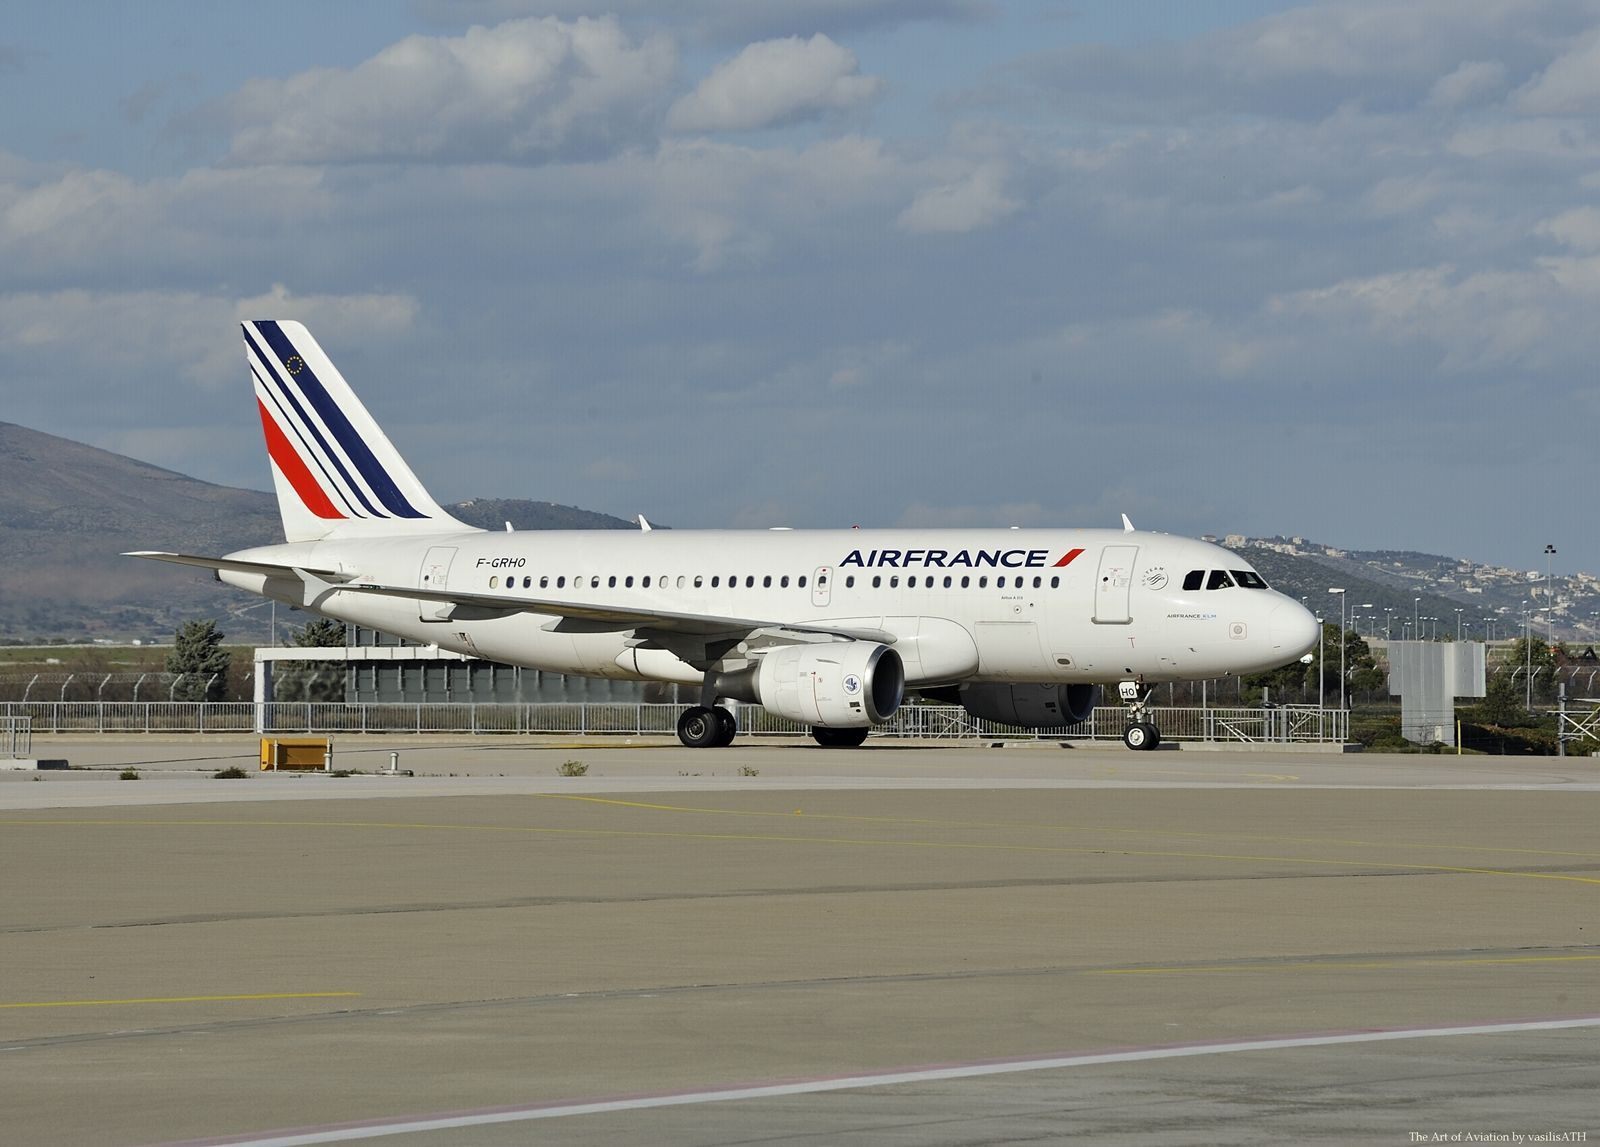 Air France Airbus A319100 cn 1271 FGRHO First Flight